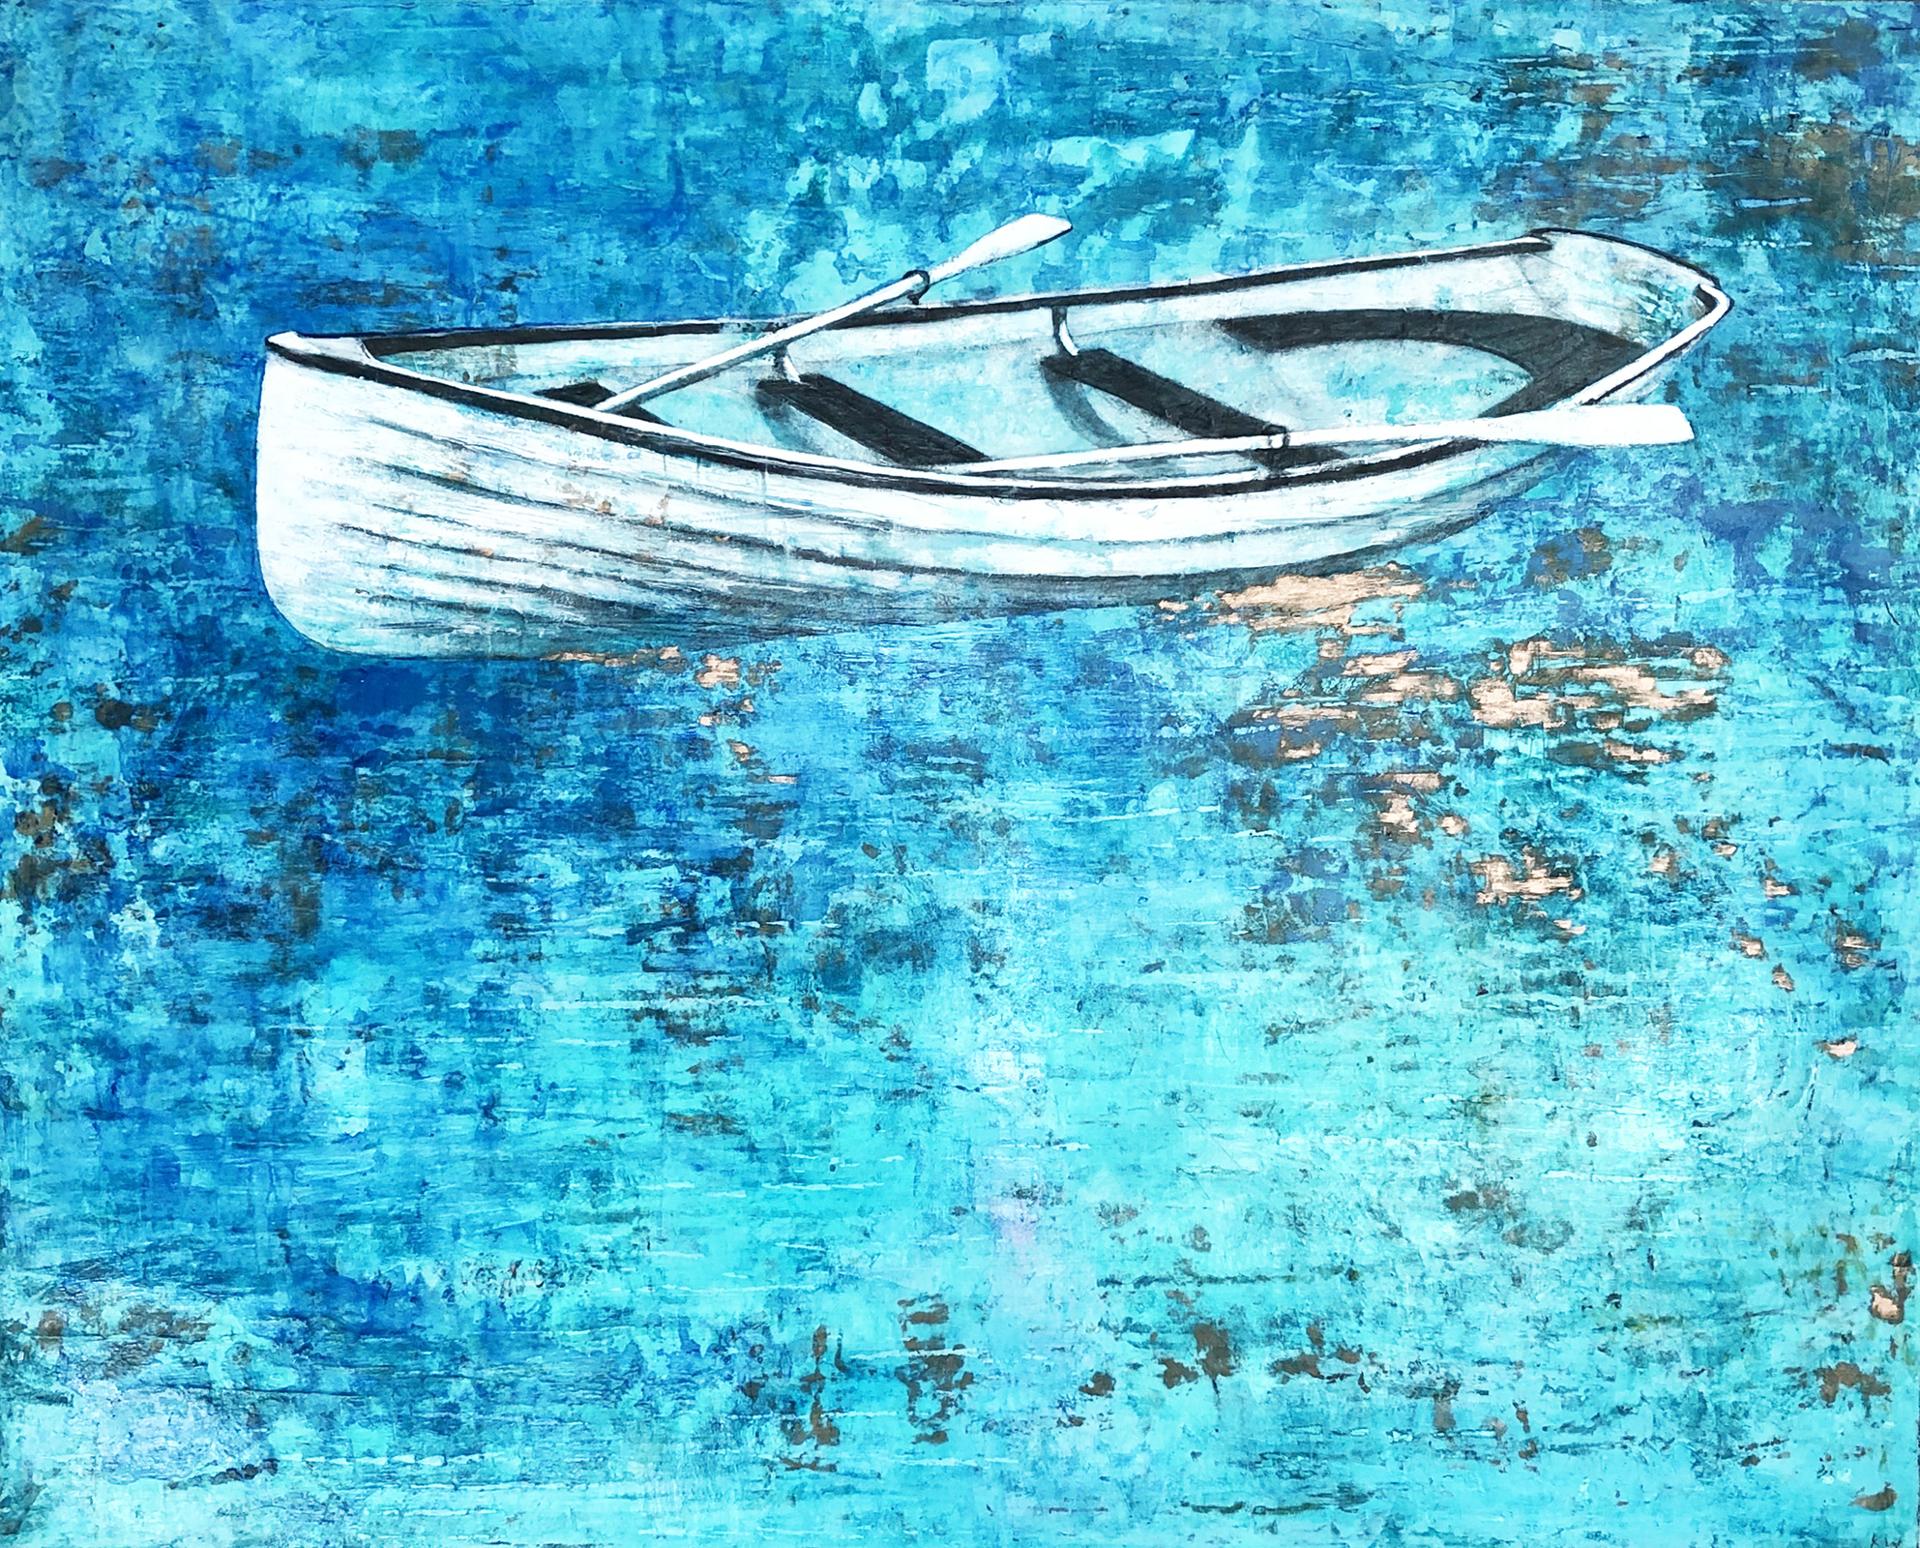 Sacred Vessel by Kimberly Wheaton